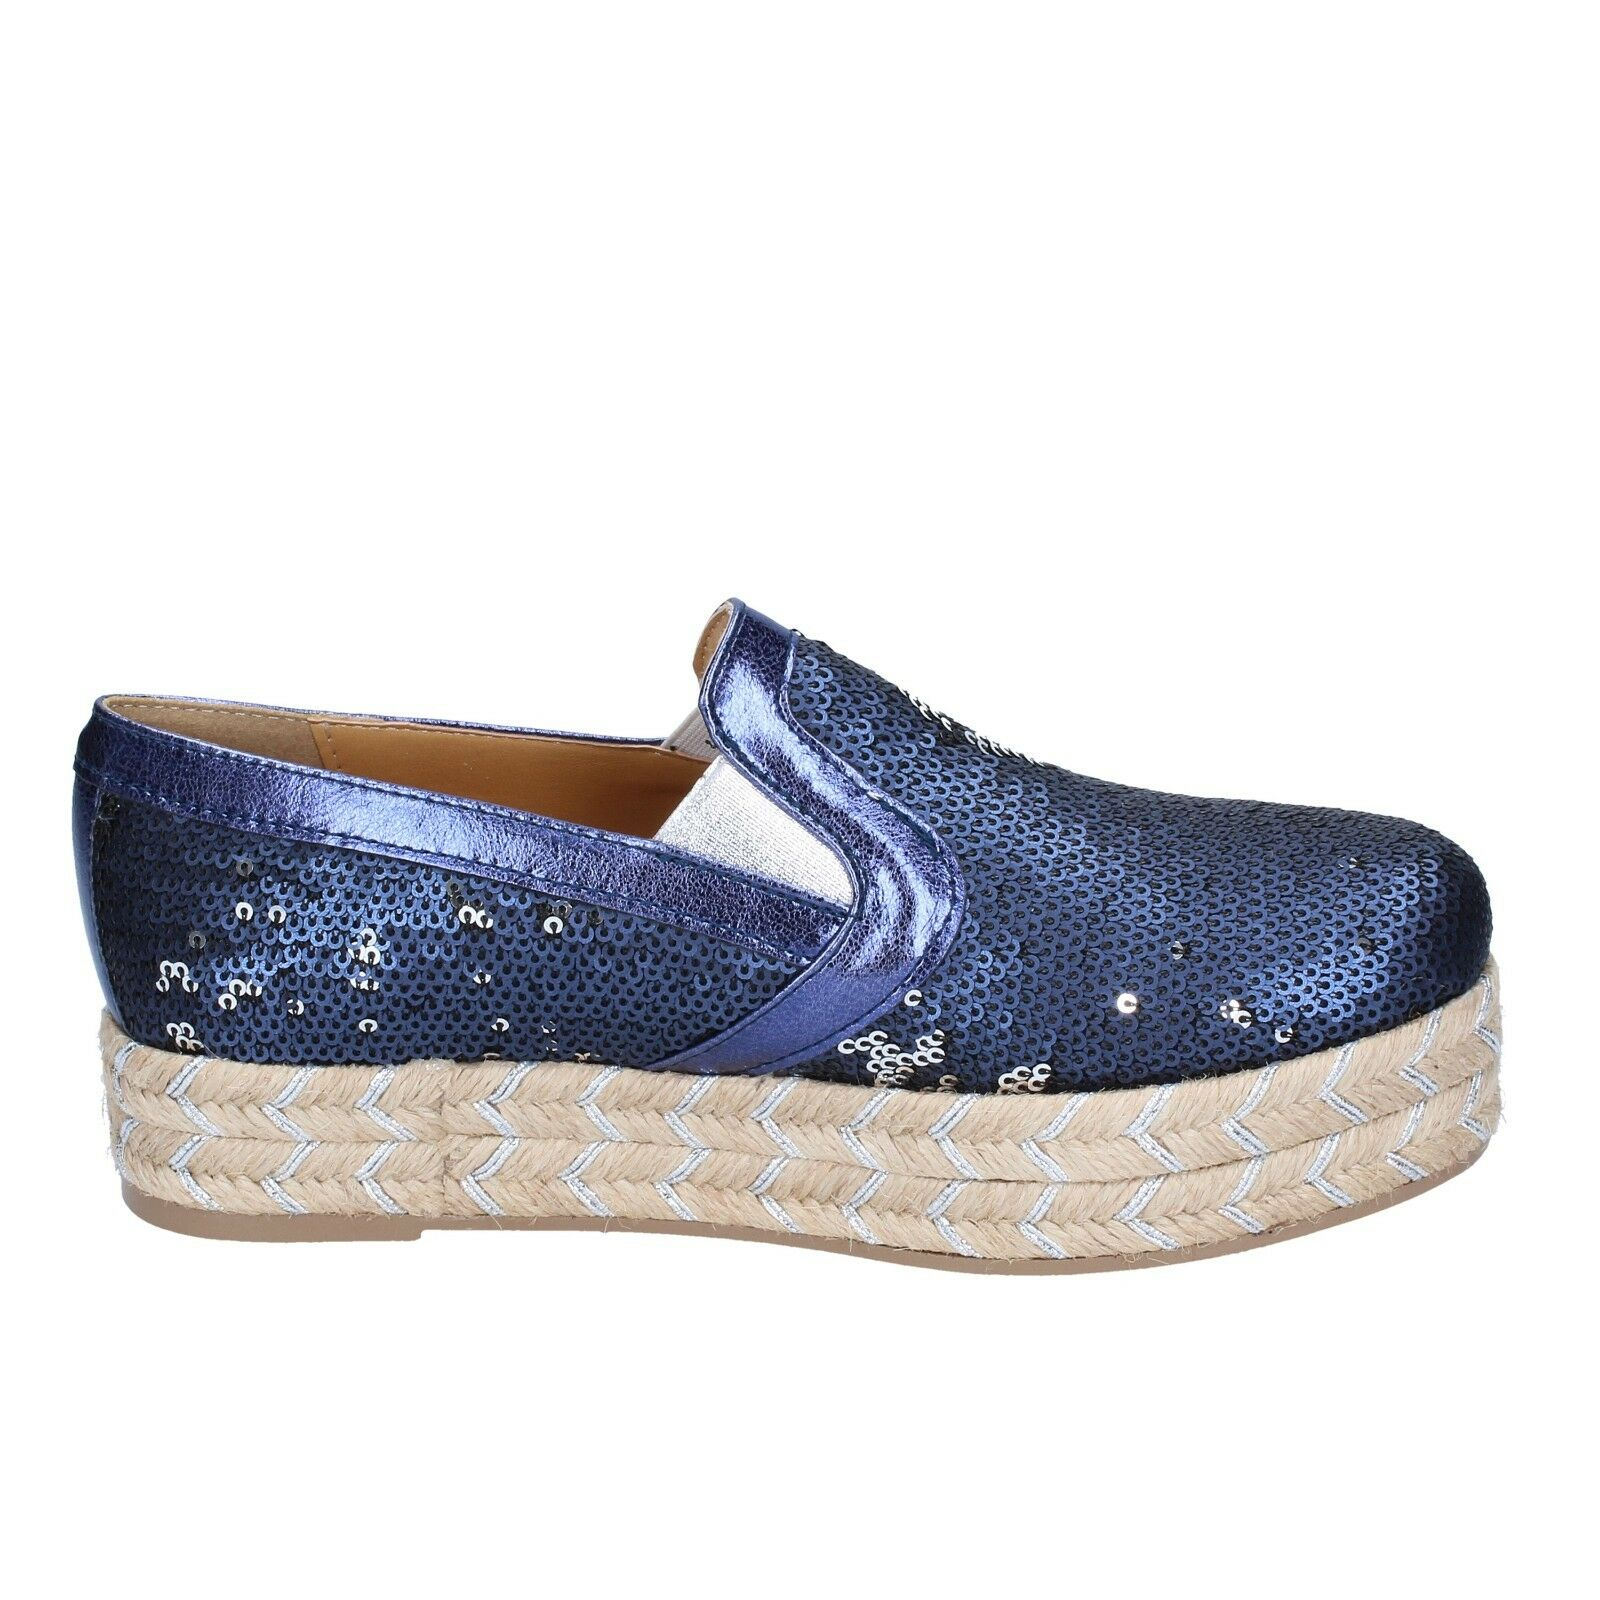 Damens's schuhe OLGA RUBINI 3 (EU 36) espadrillas slip on pailettes Blau pailettes on BS110-36 088fa8